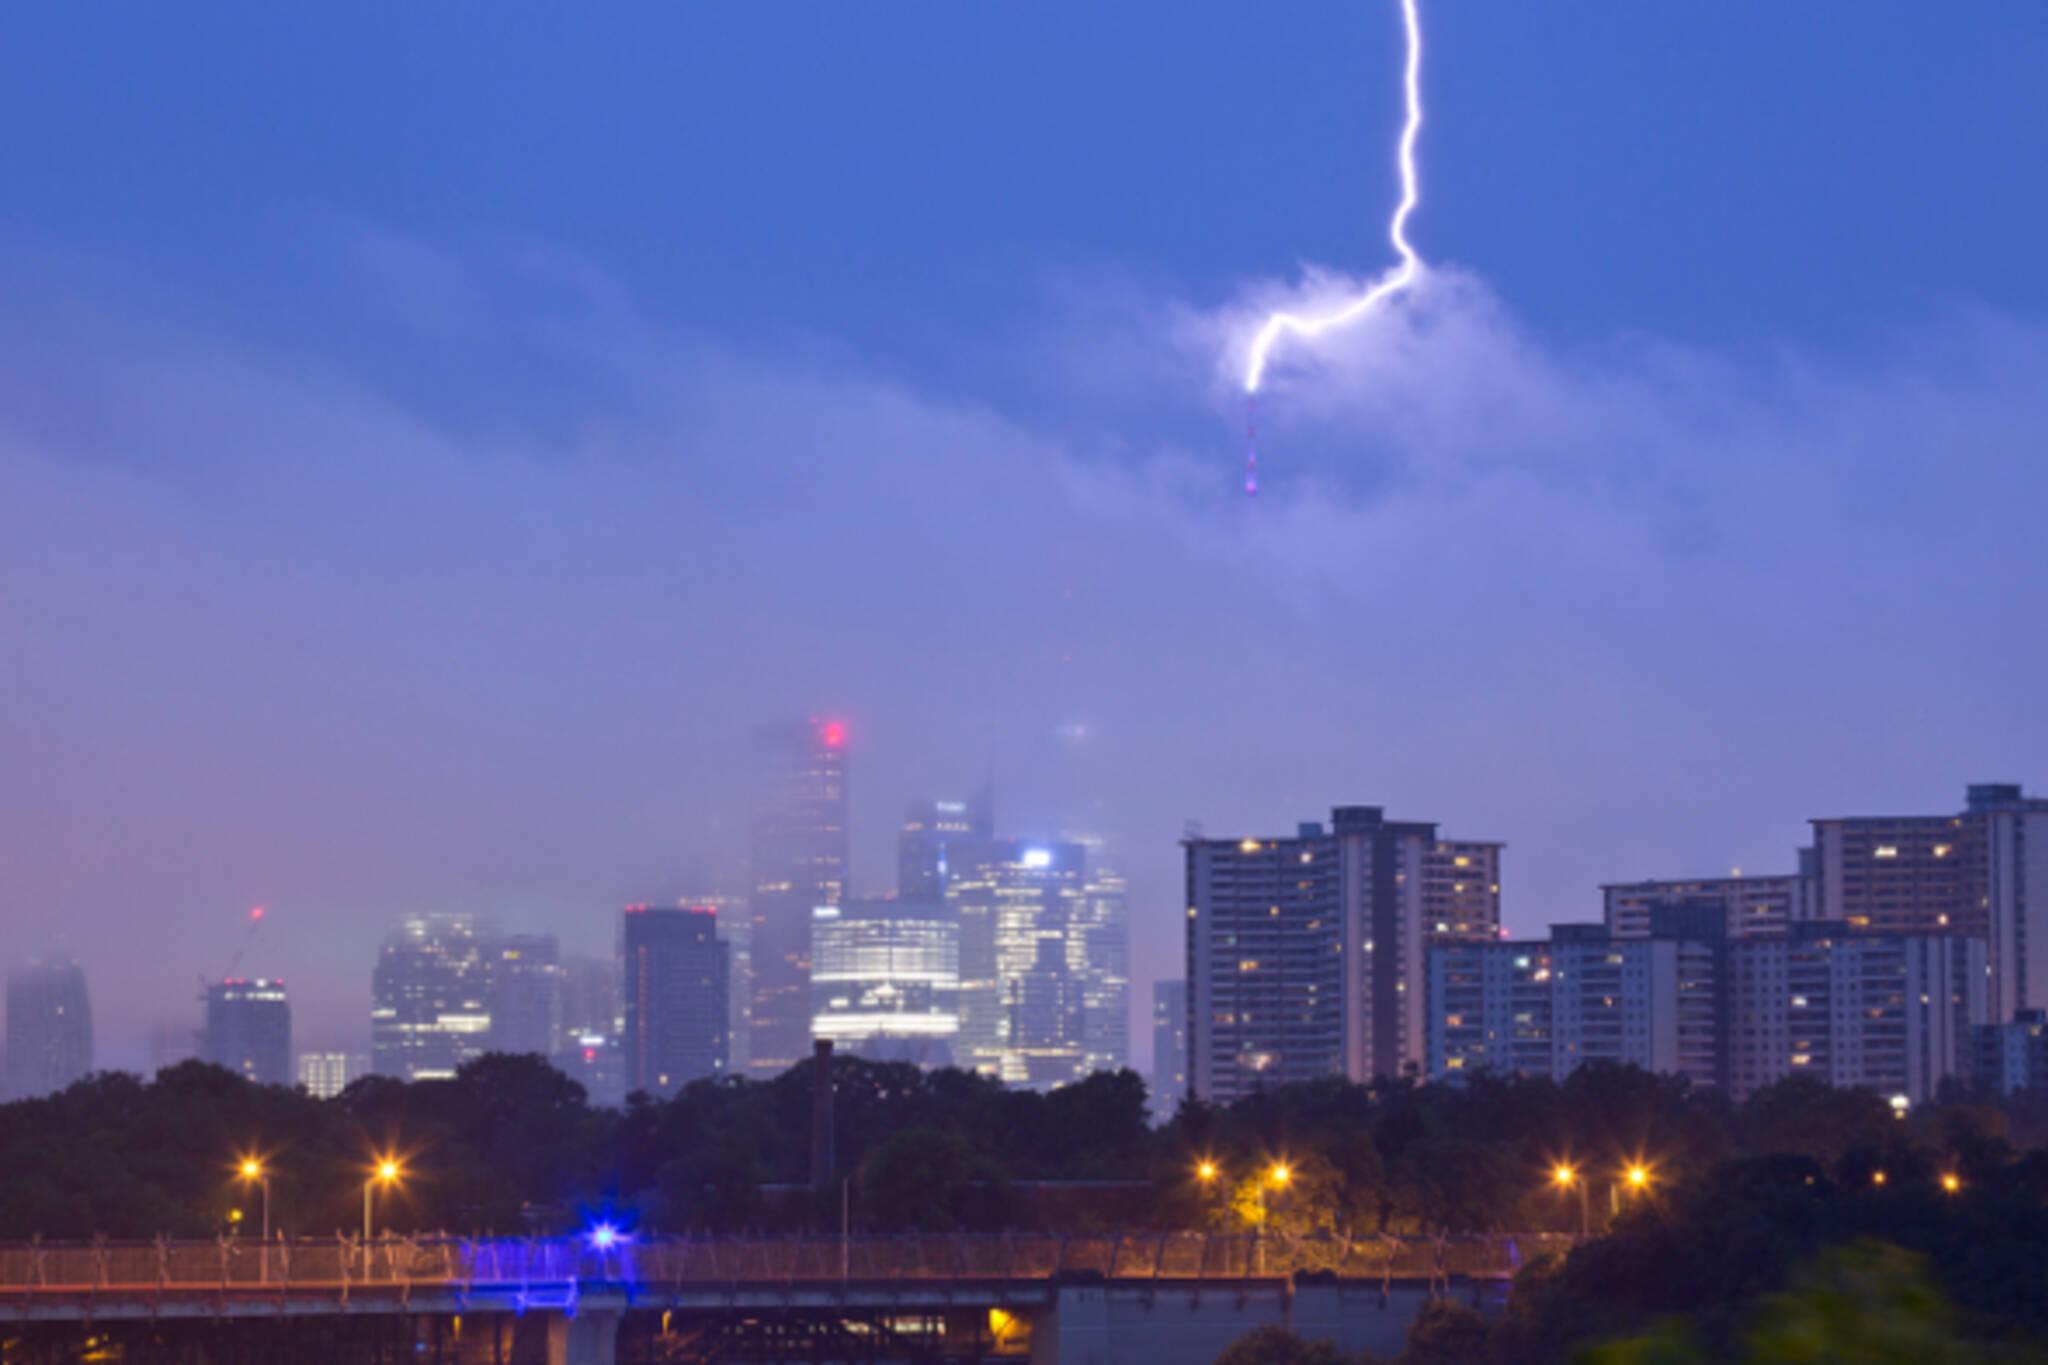 Toronto thunderstorm